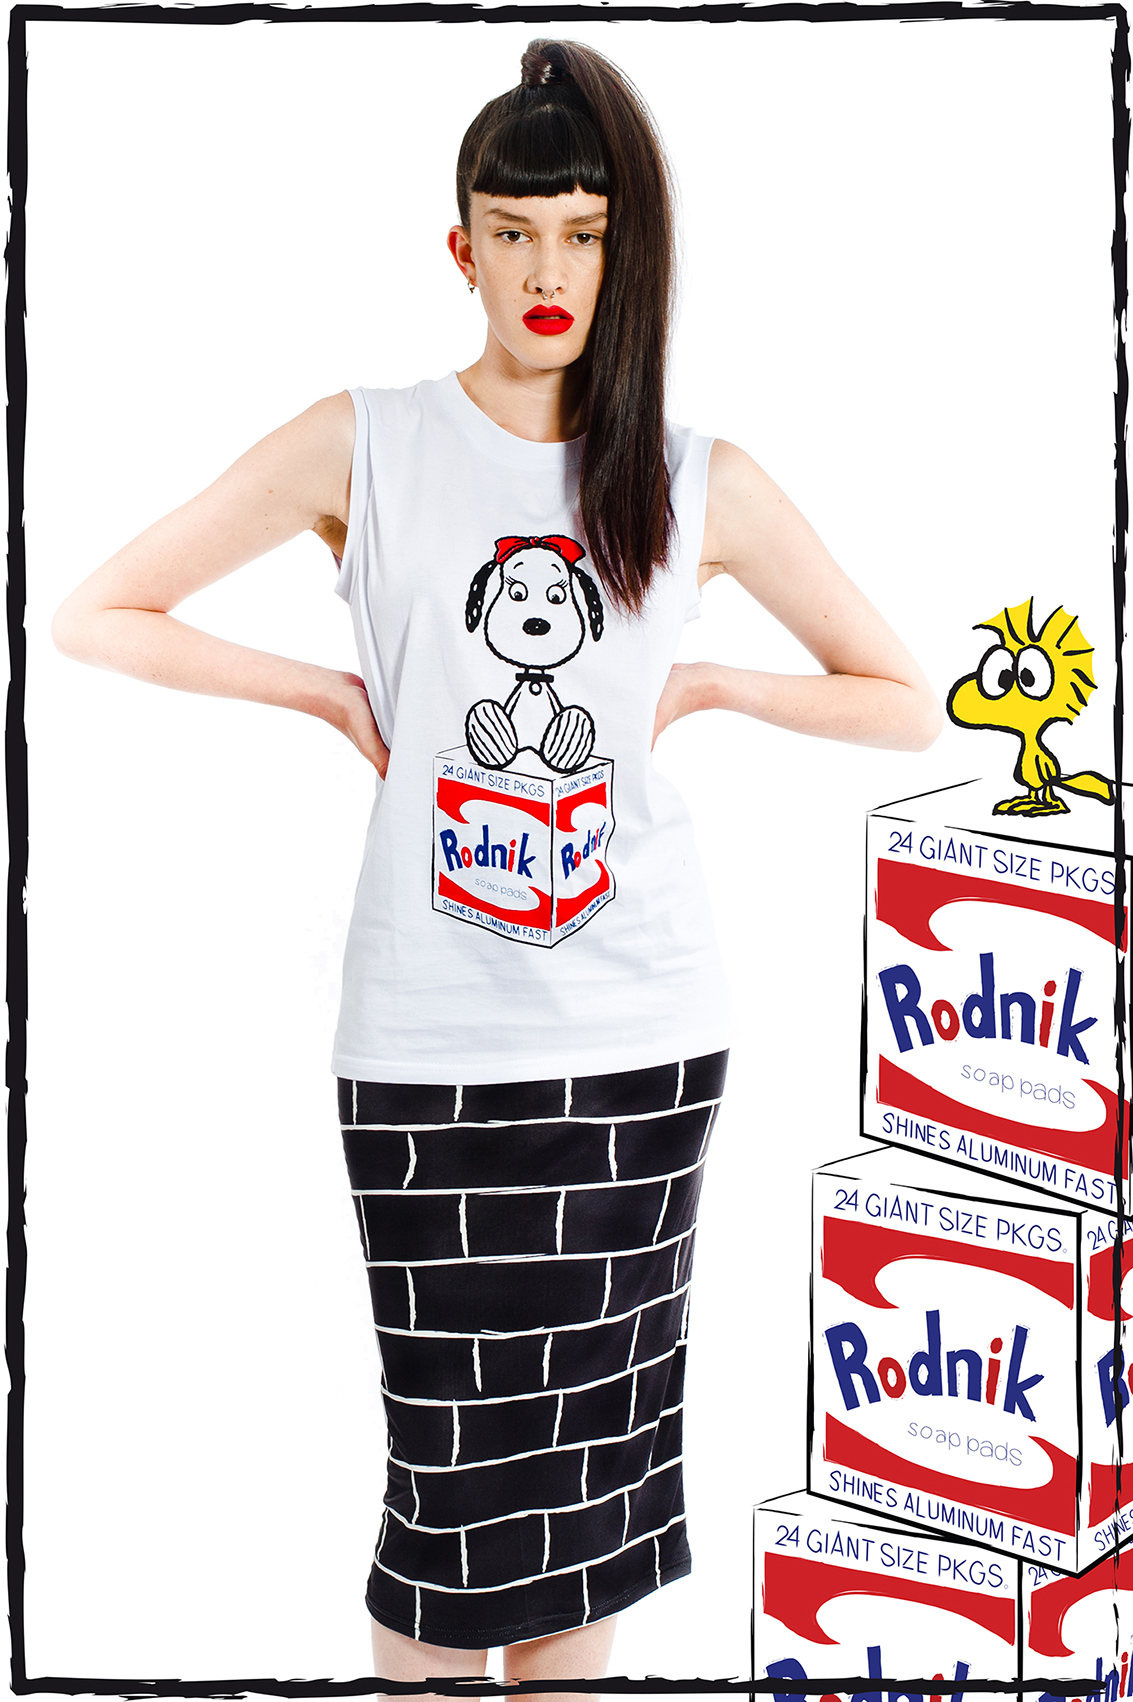 rodnik x peanuts for galeries lafayette (8 of16)